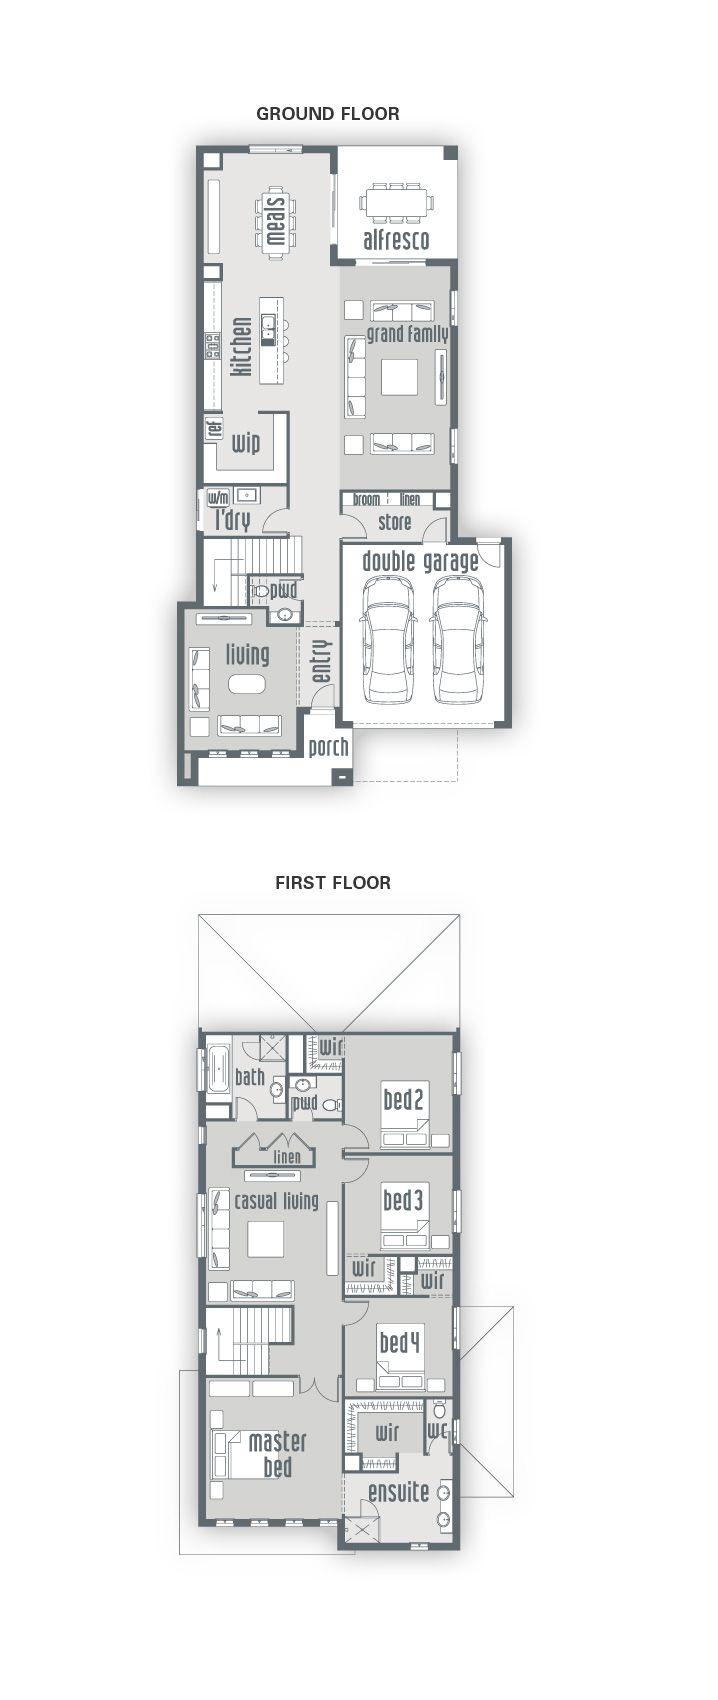 Building House Santena   New Home Designs   Urbanedge Homes - Melbourne Builders